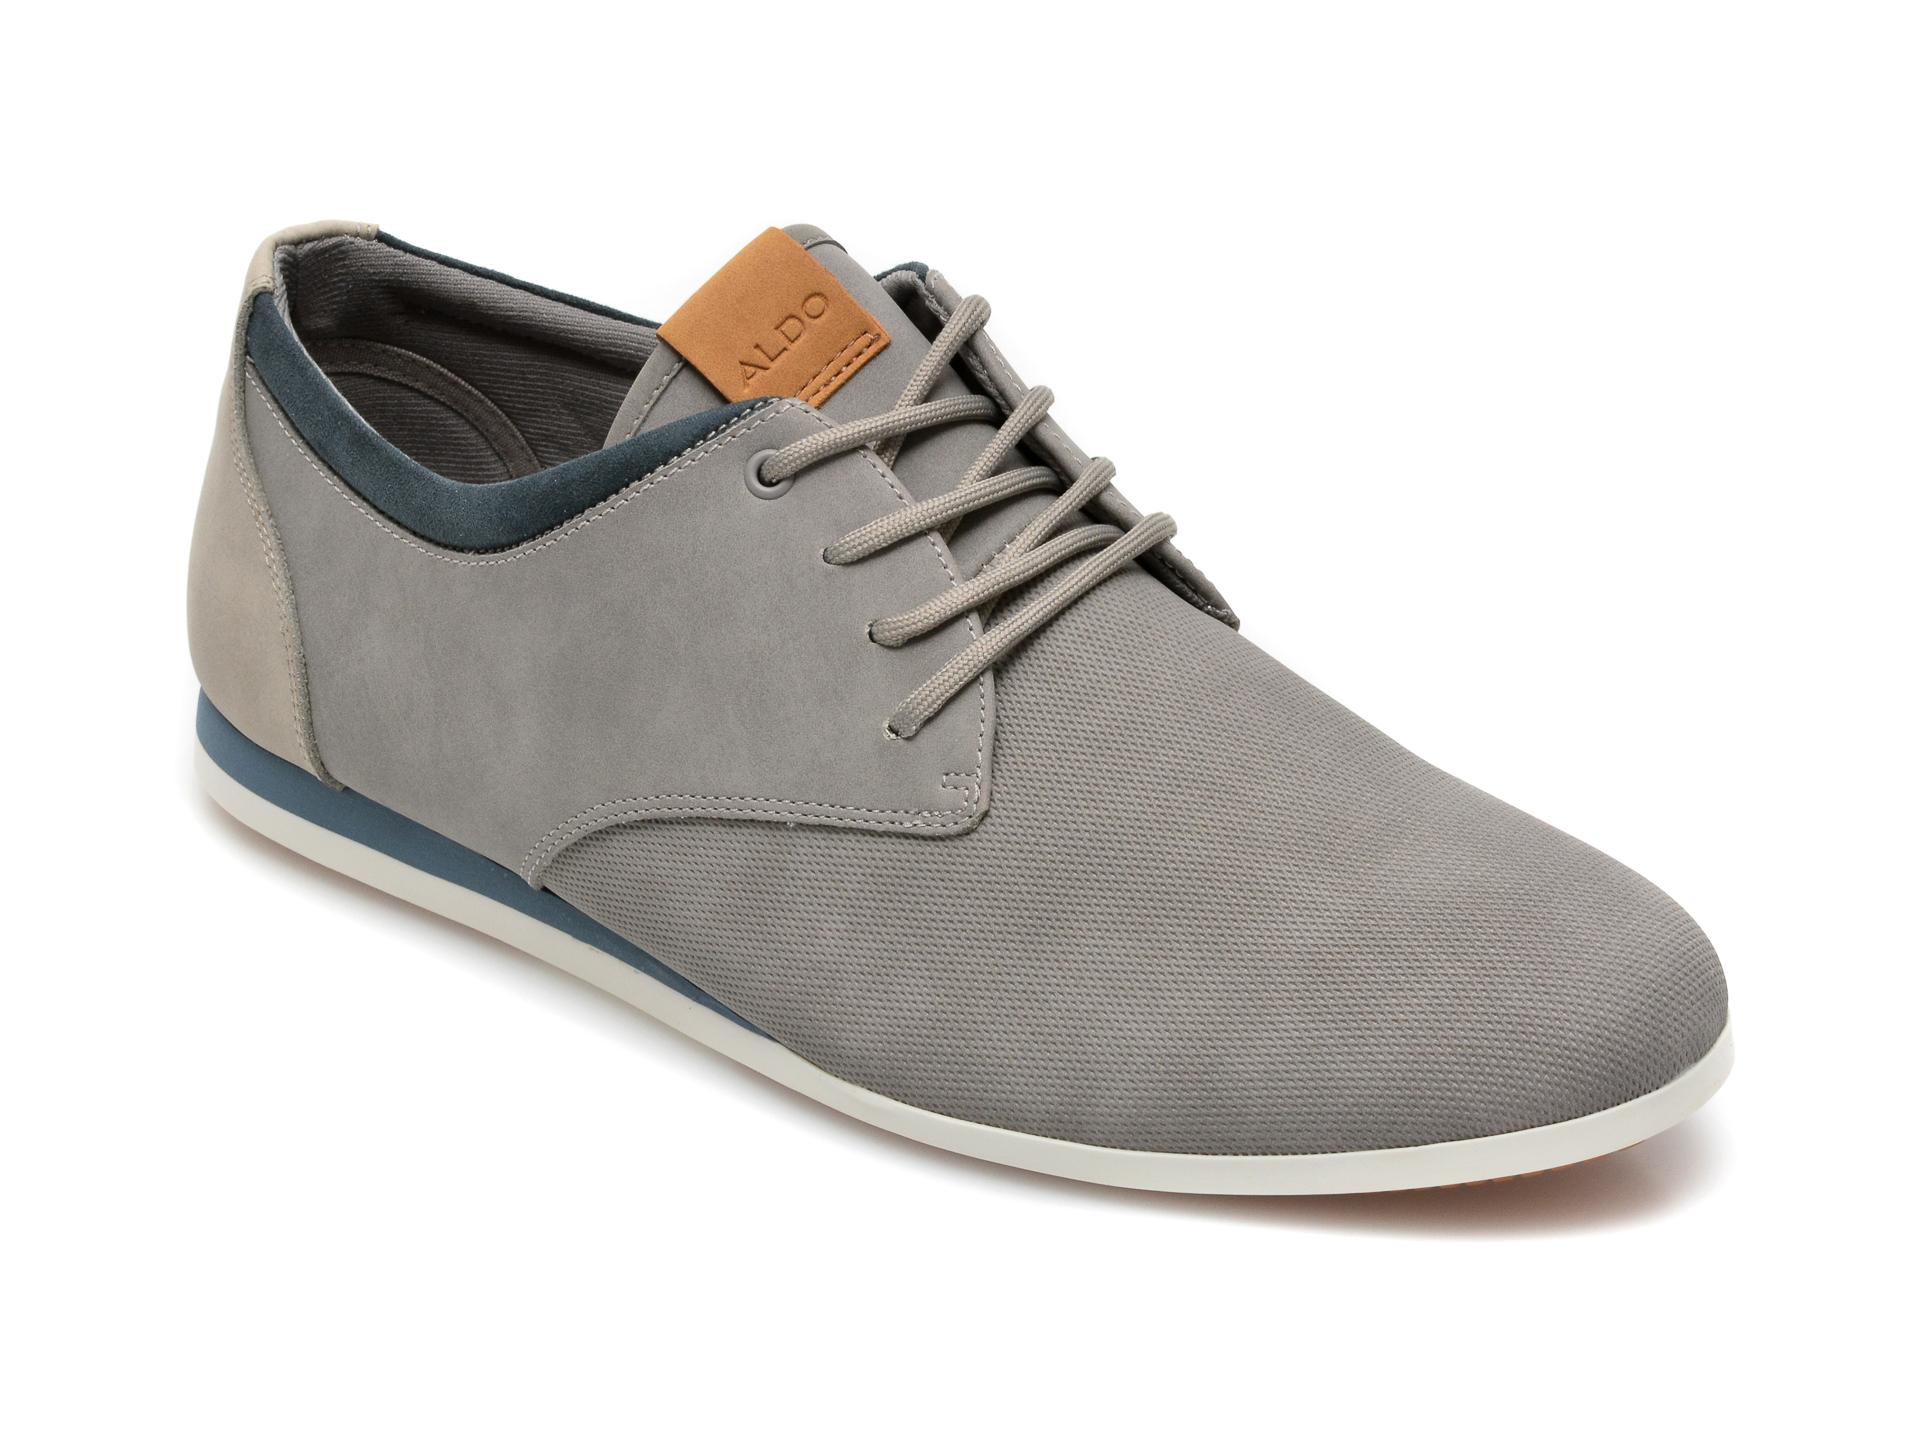 Pantofi ALDO gri, Aauwen-R020, din material textil si piele ecologica imagine otter.ro 2021